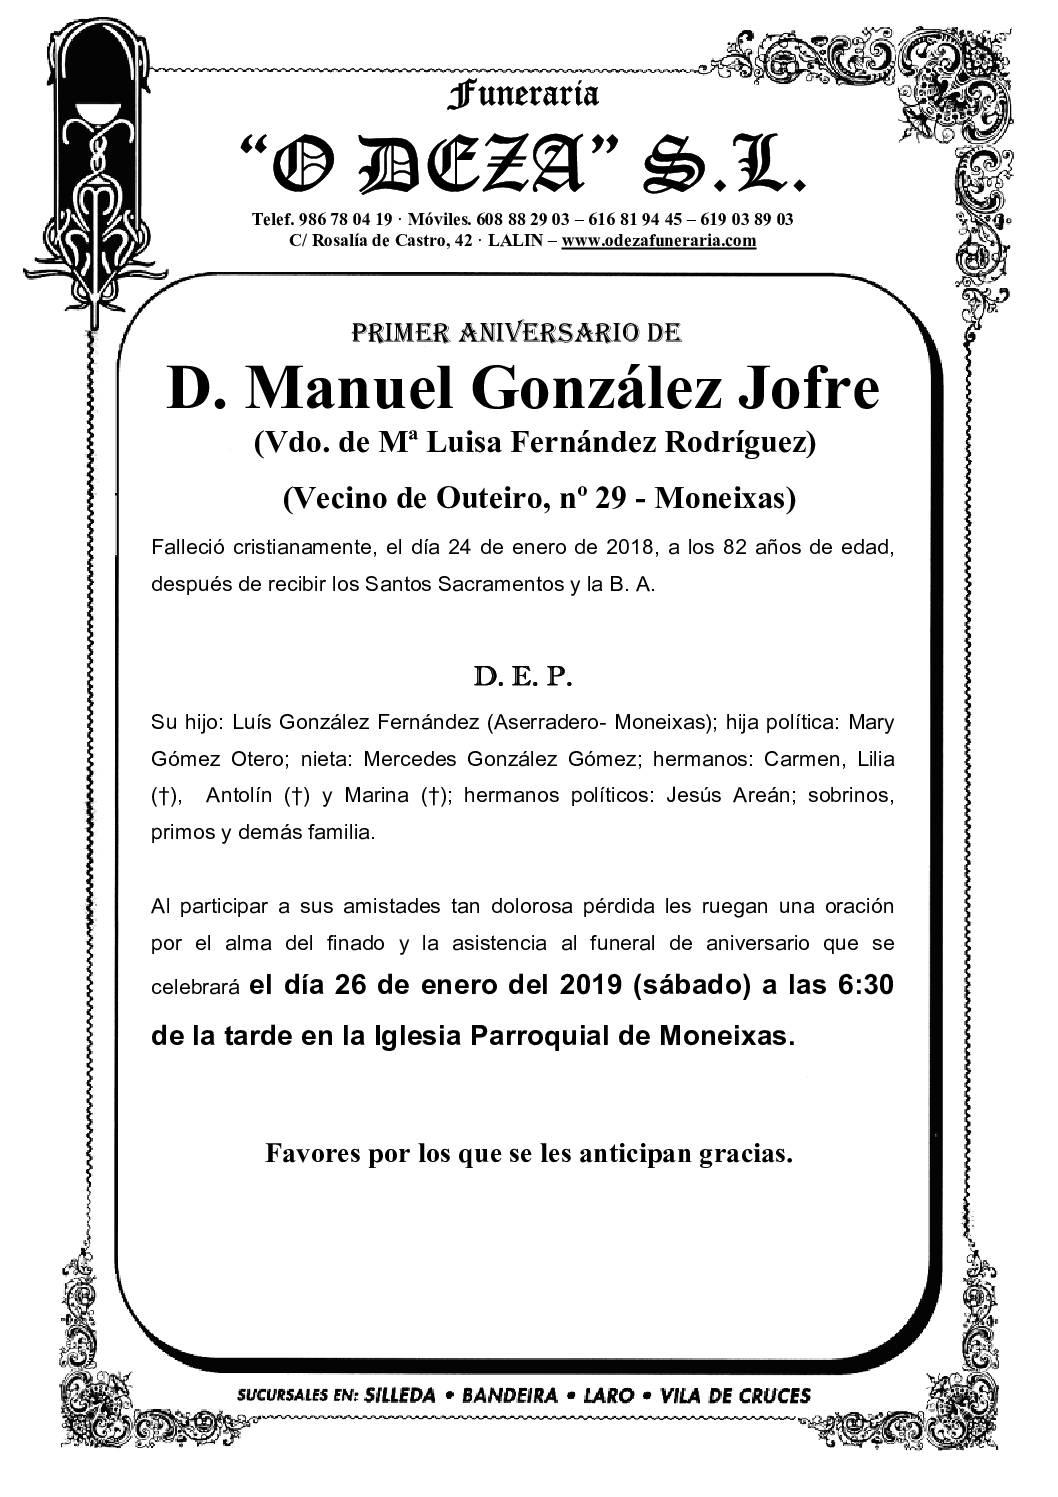 D. MANUEL GONZÁLEZ JOFRE